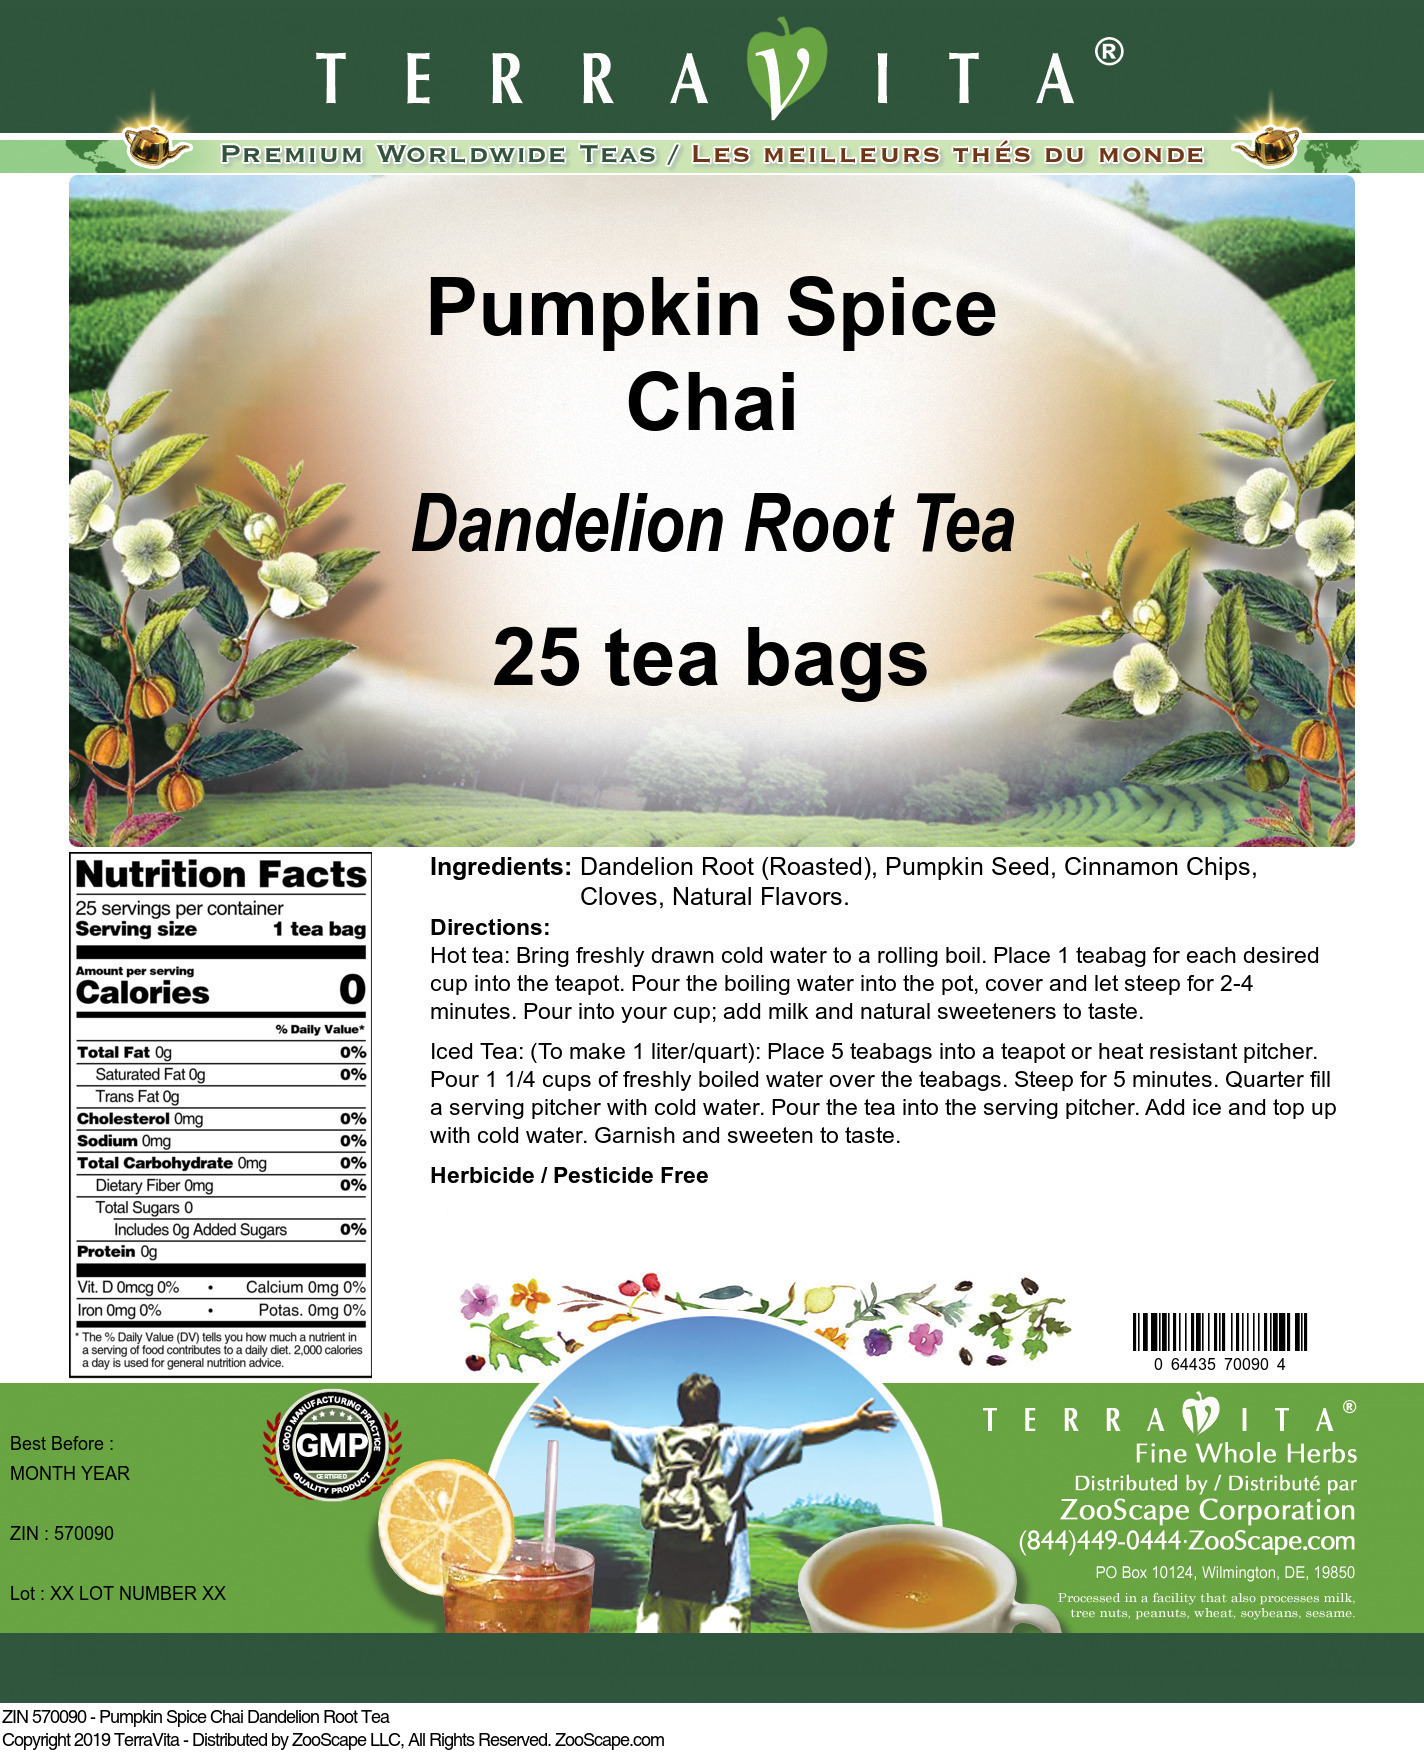 Pumpkin Spice Chai Dandelion Root Tea